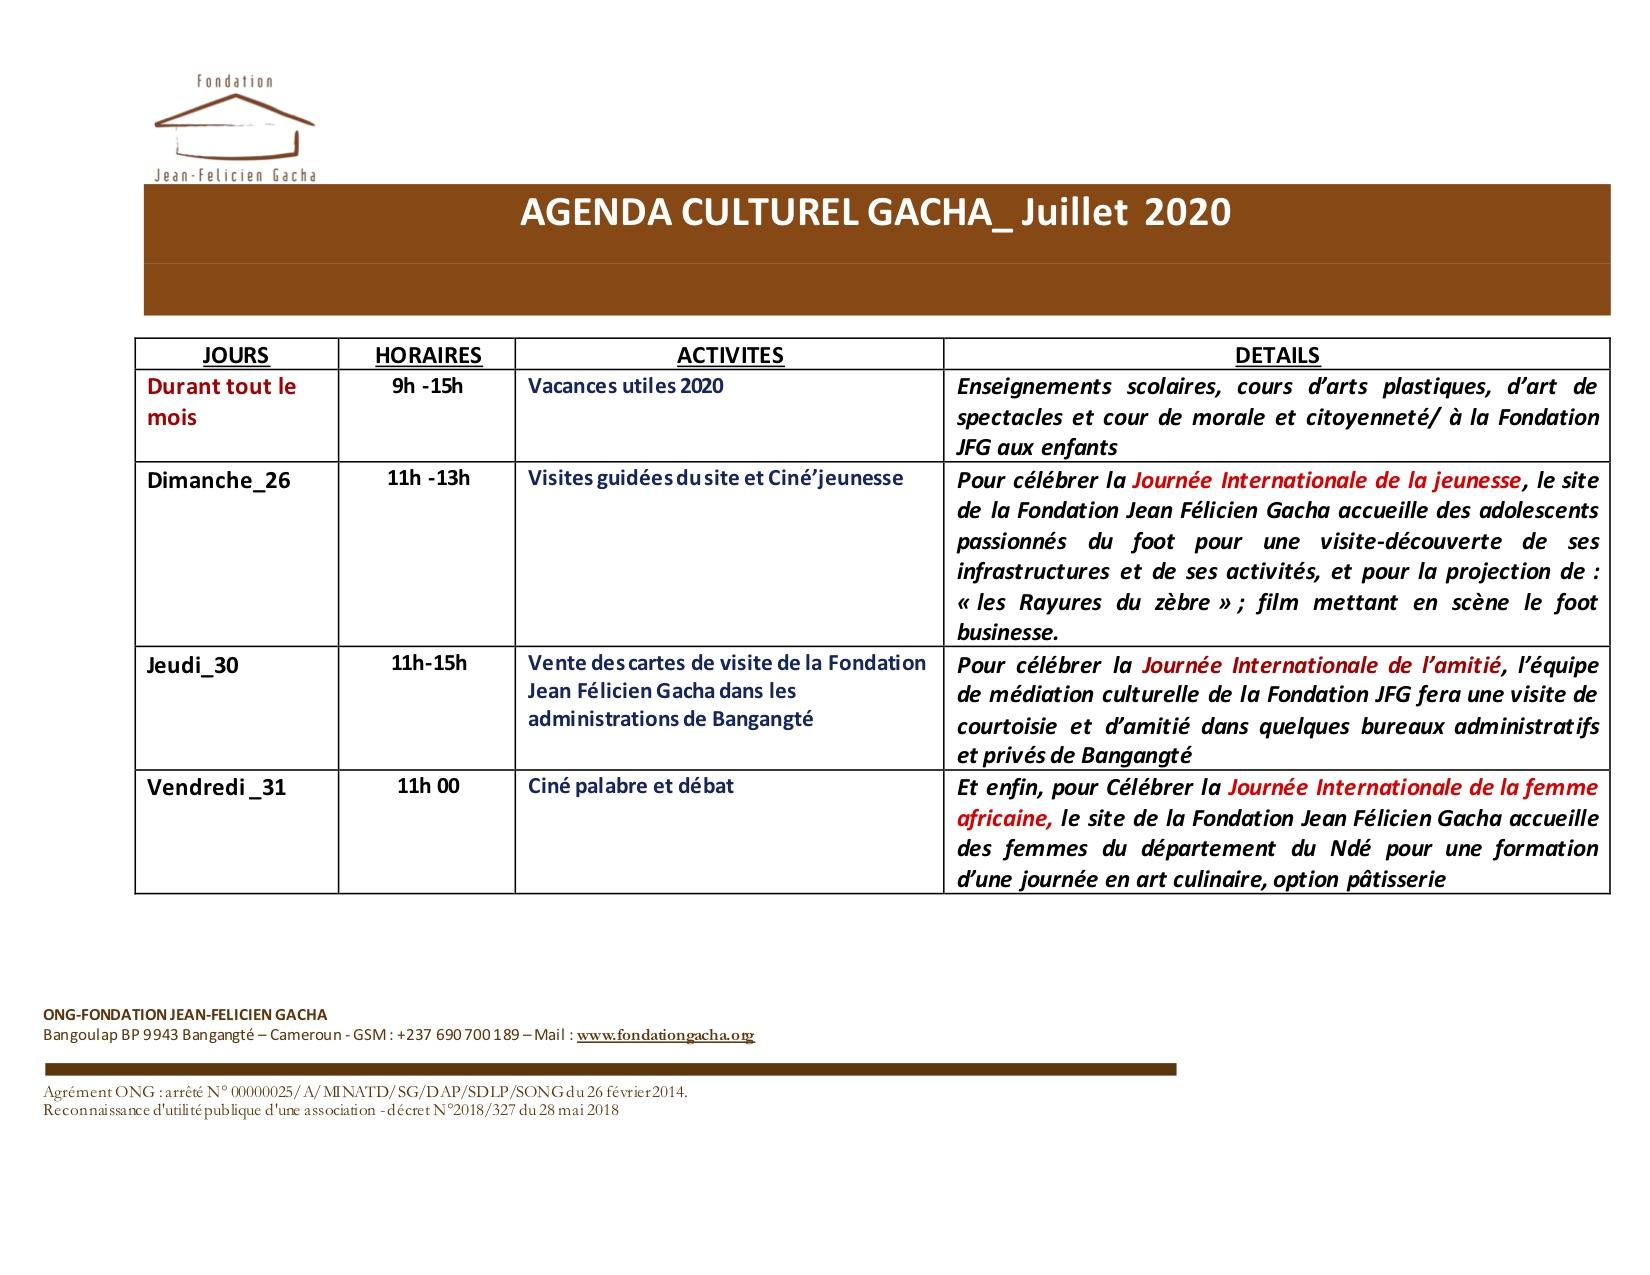 Agenda culturel estival : le mois de juillet